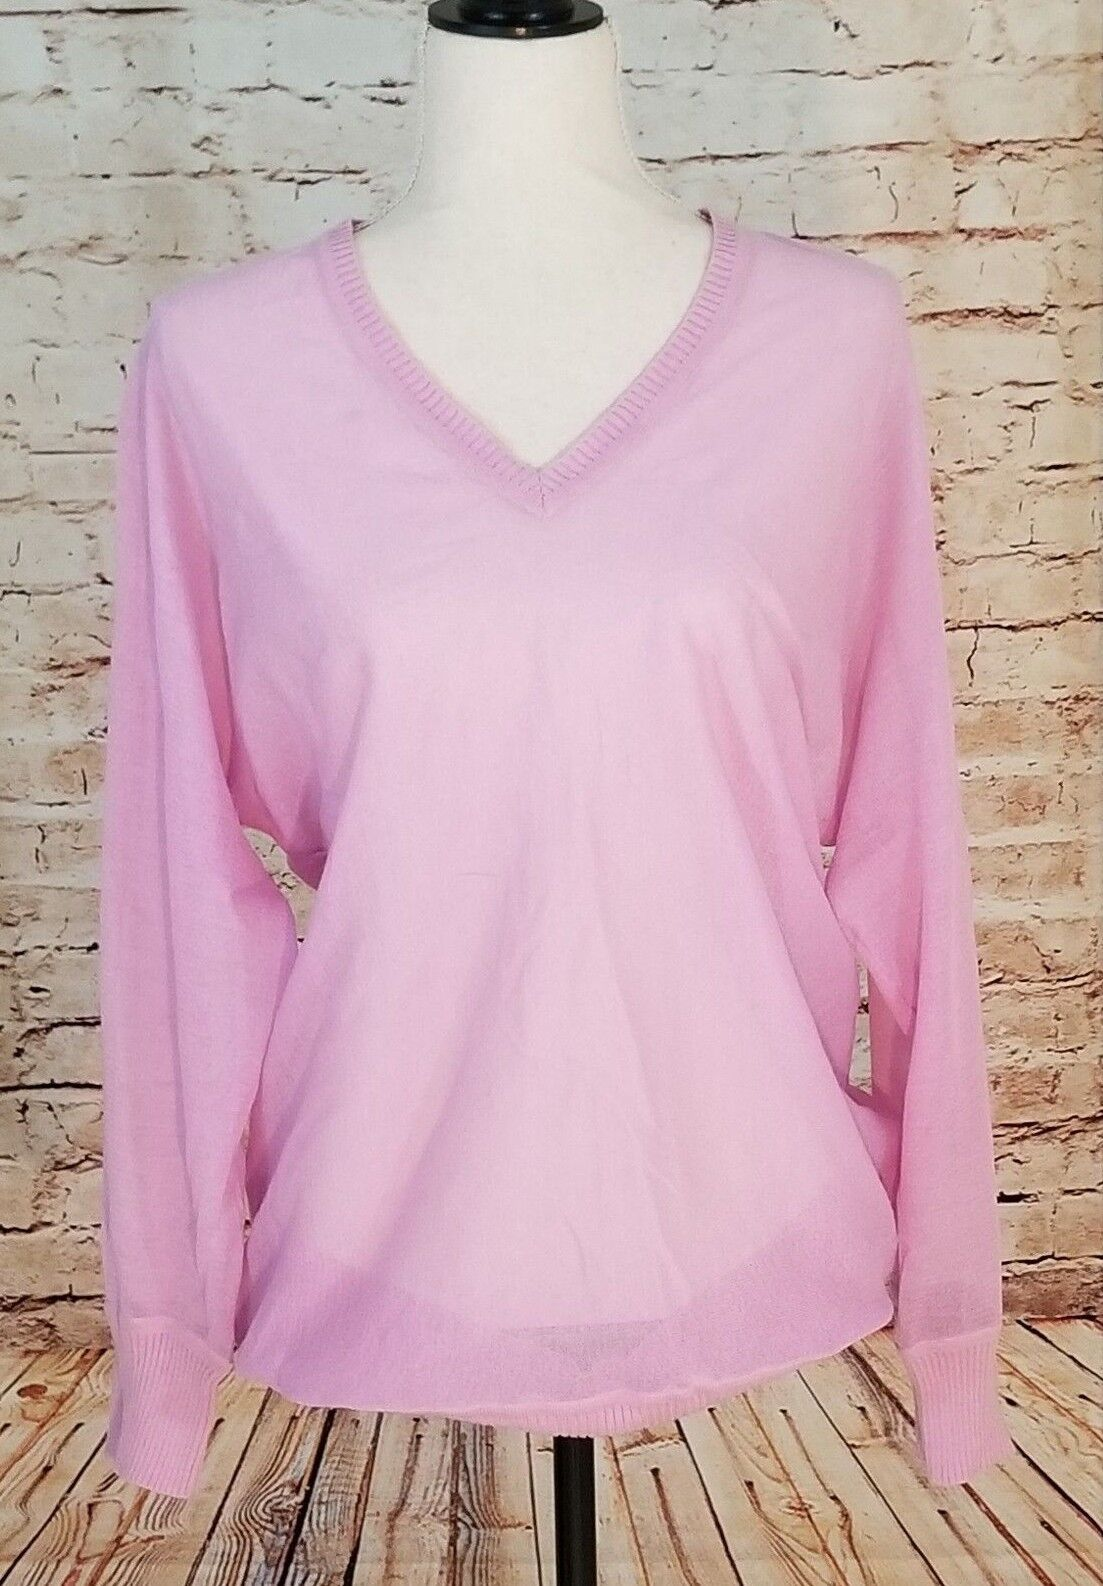 DKNY Pretty Pink Knit Long Sleeve Sweater Top L